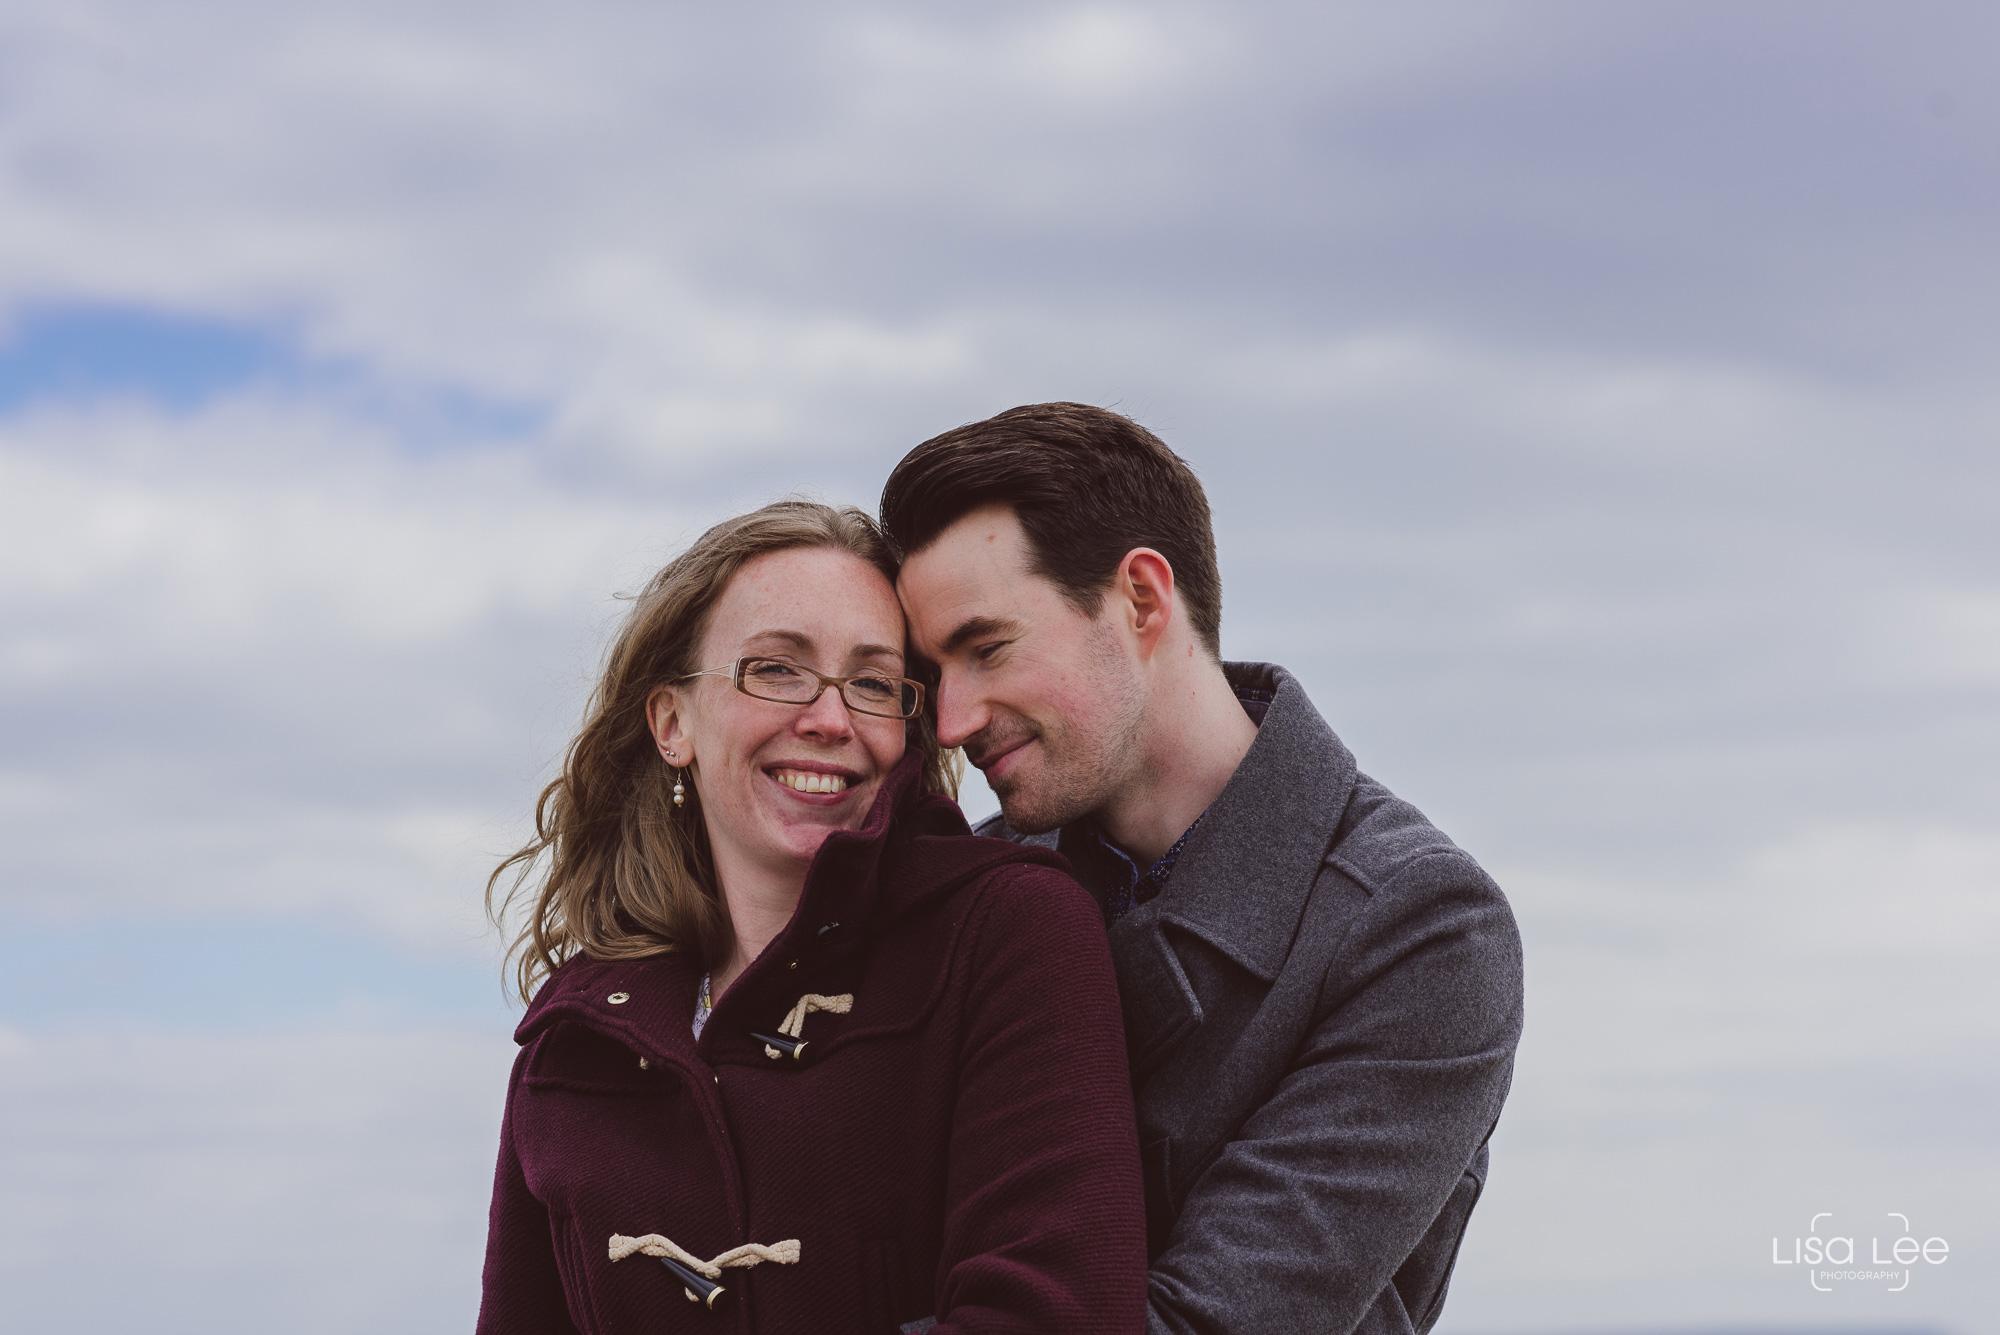 creative-documentary-wedding-photography-adventure-dorset.jpg